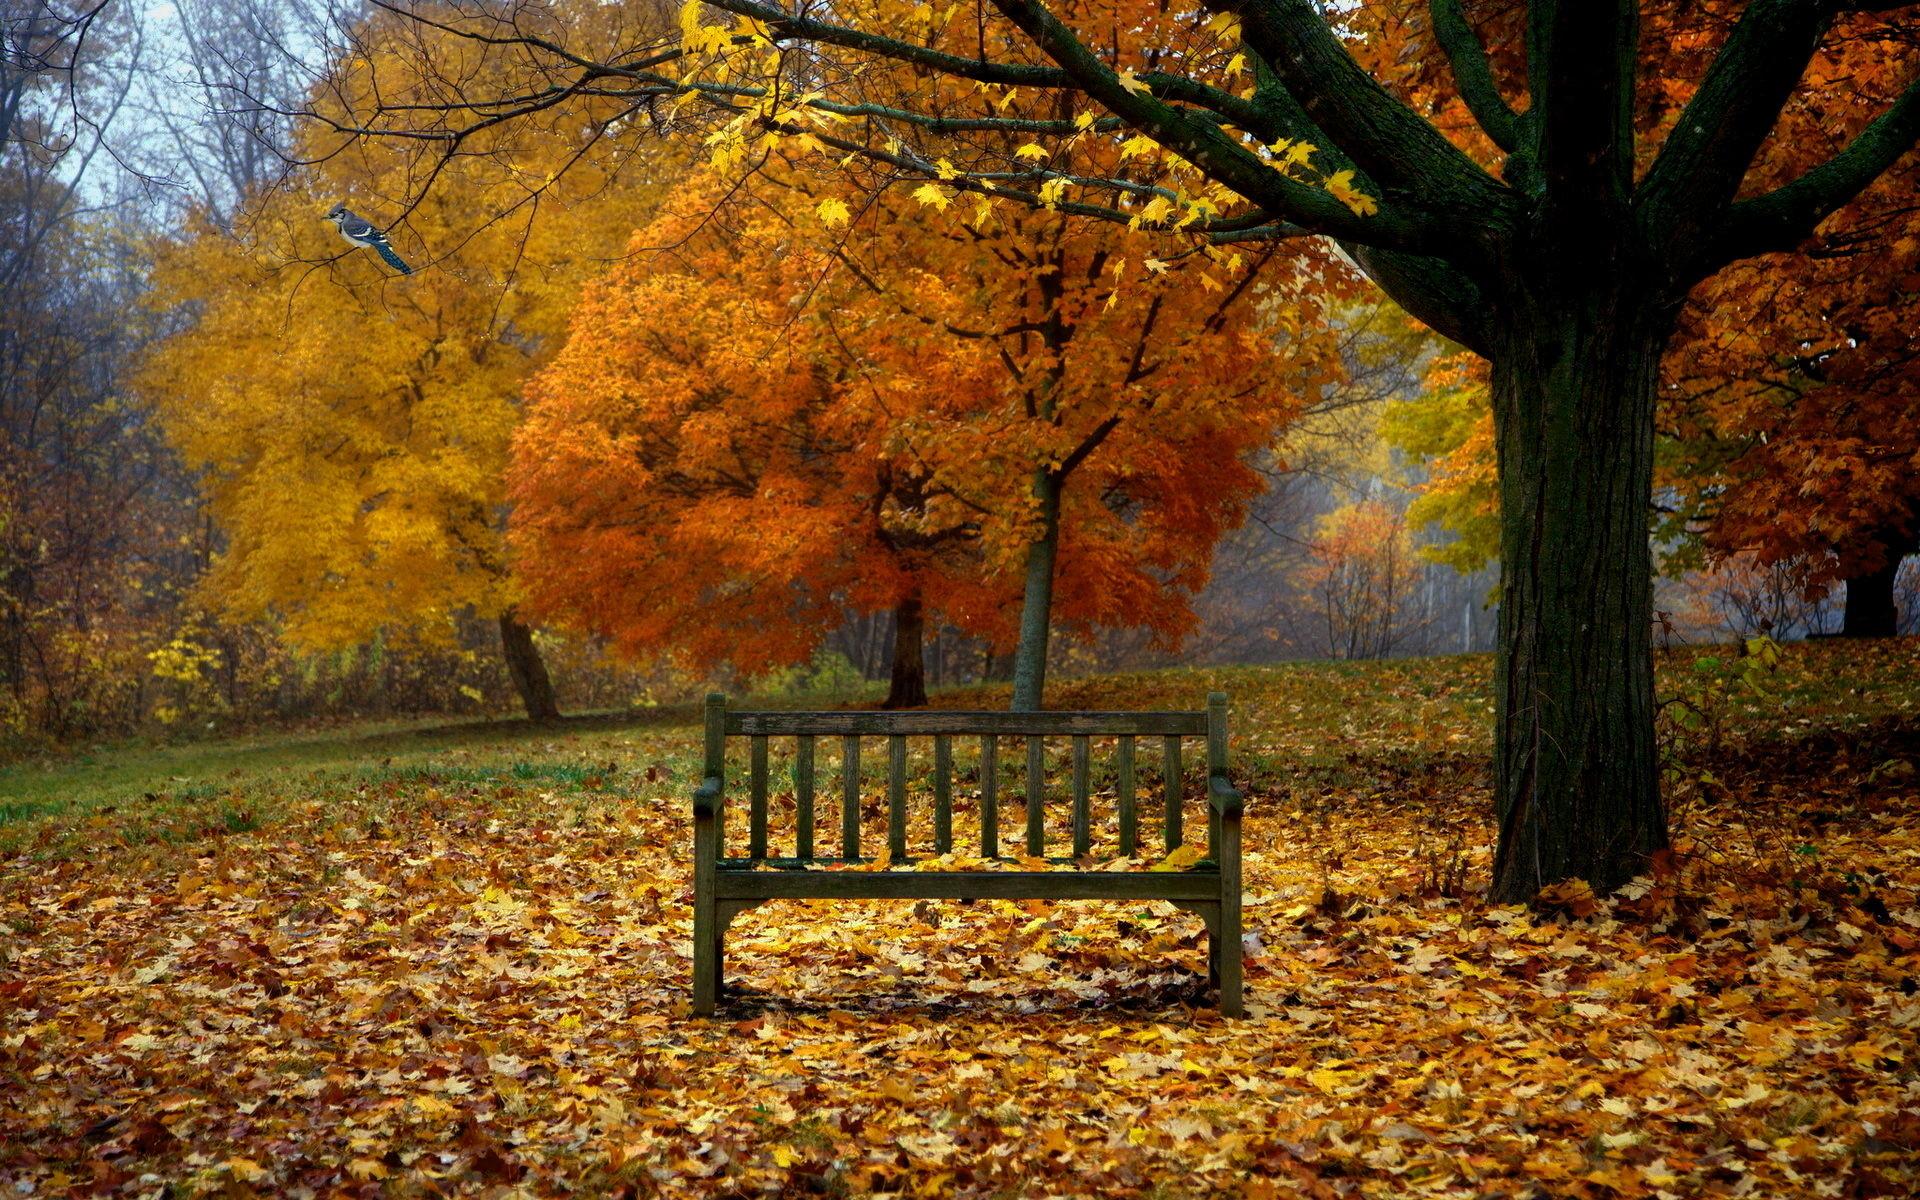 Beautiful fall scenery wallpaper 49 images - Pics of fall scenes ...